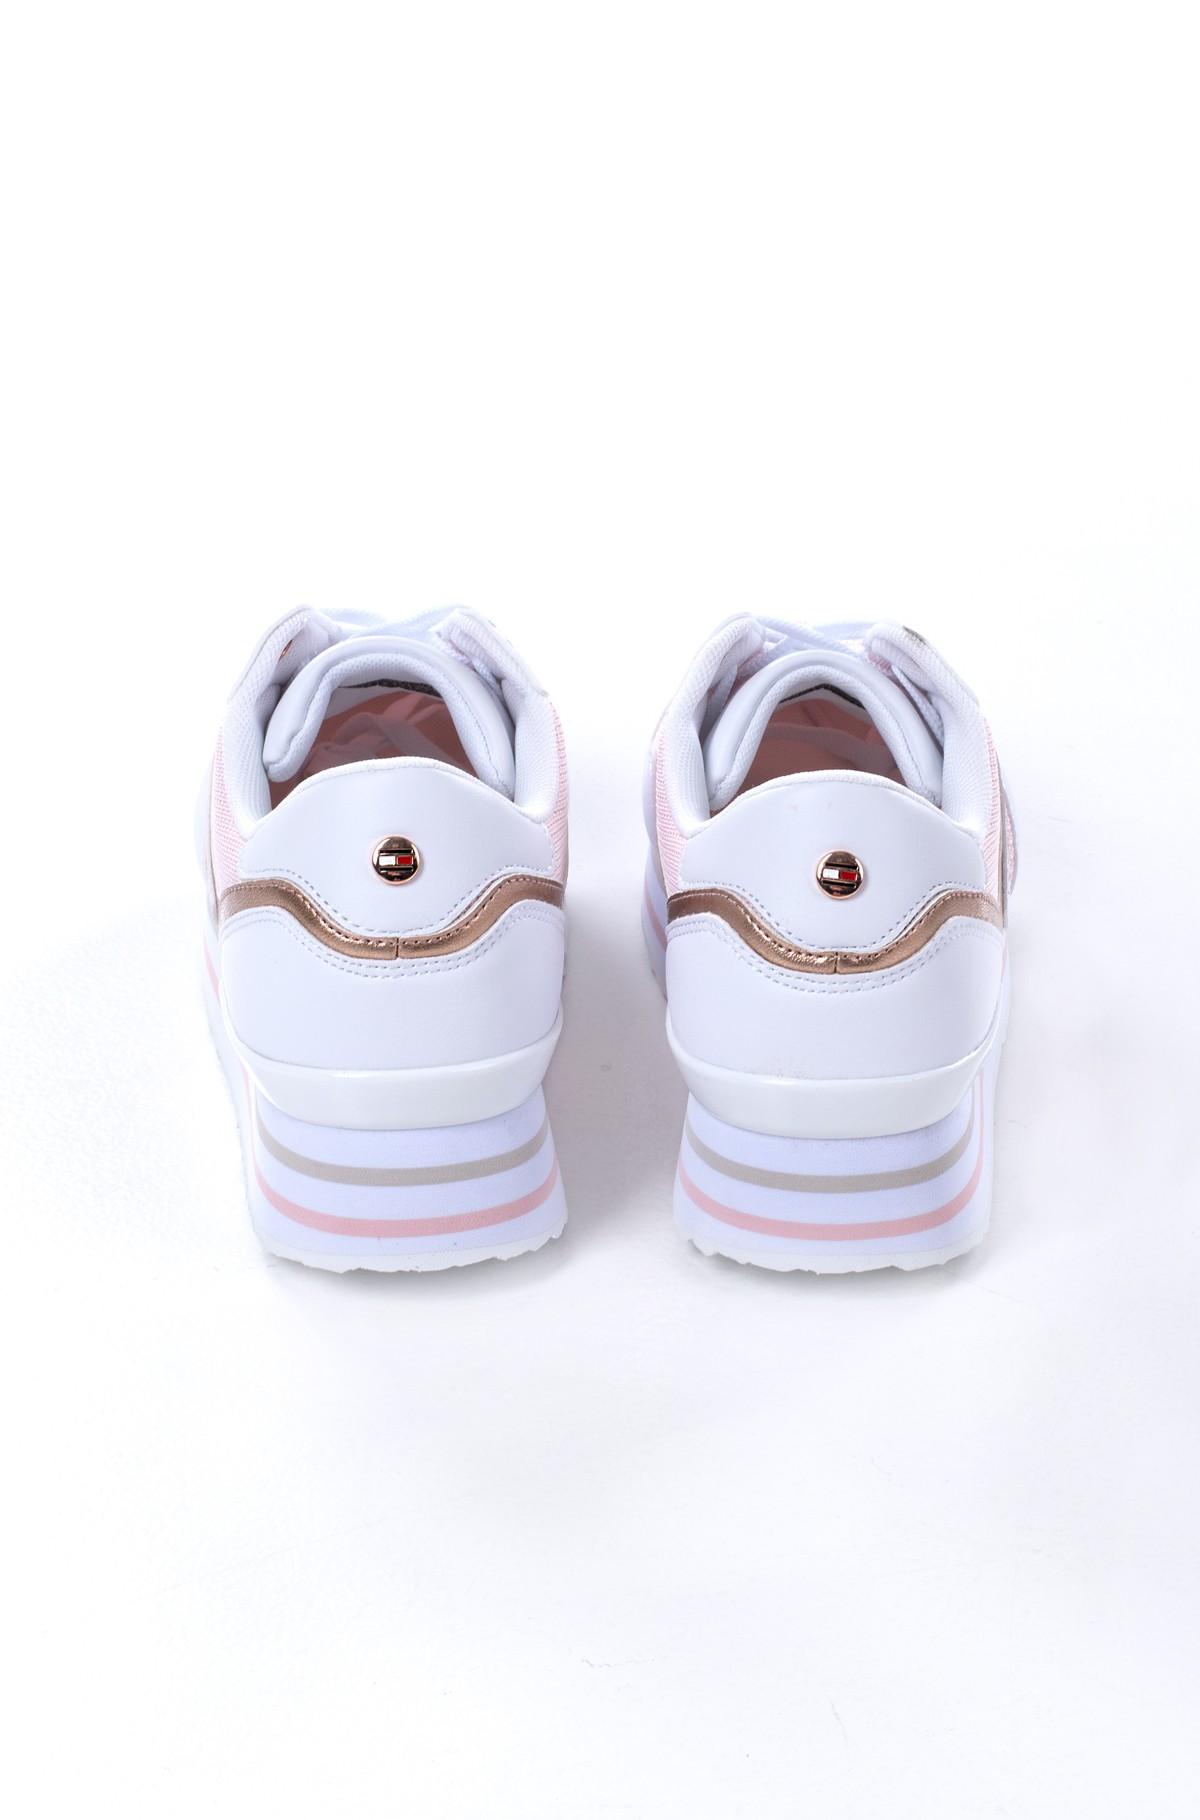 Platform sneakers  KNITTED FLATFORM SNEAKER-full-3